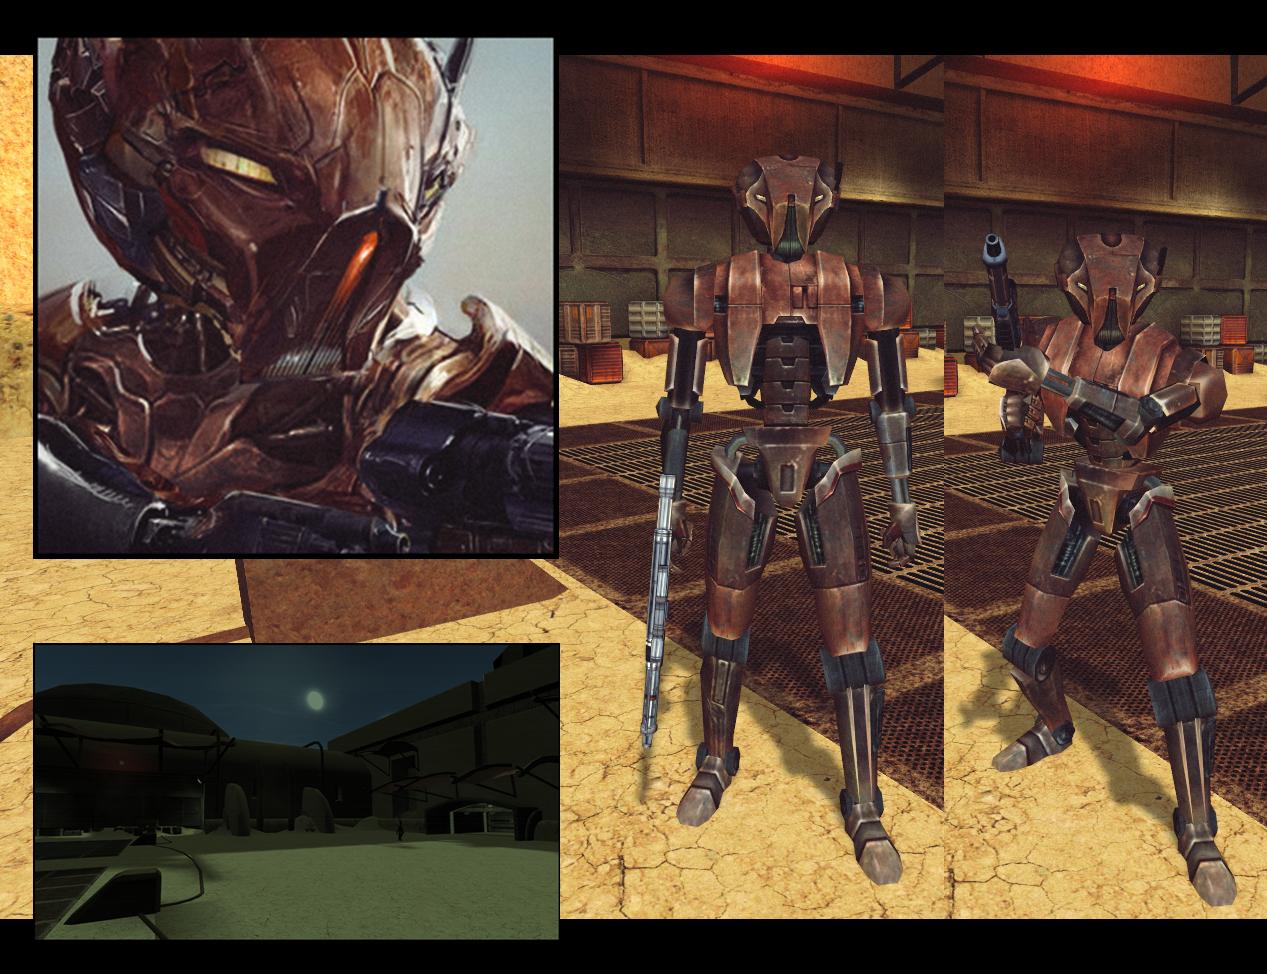 The Companions: HK-47